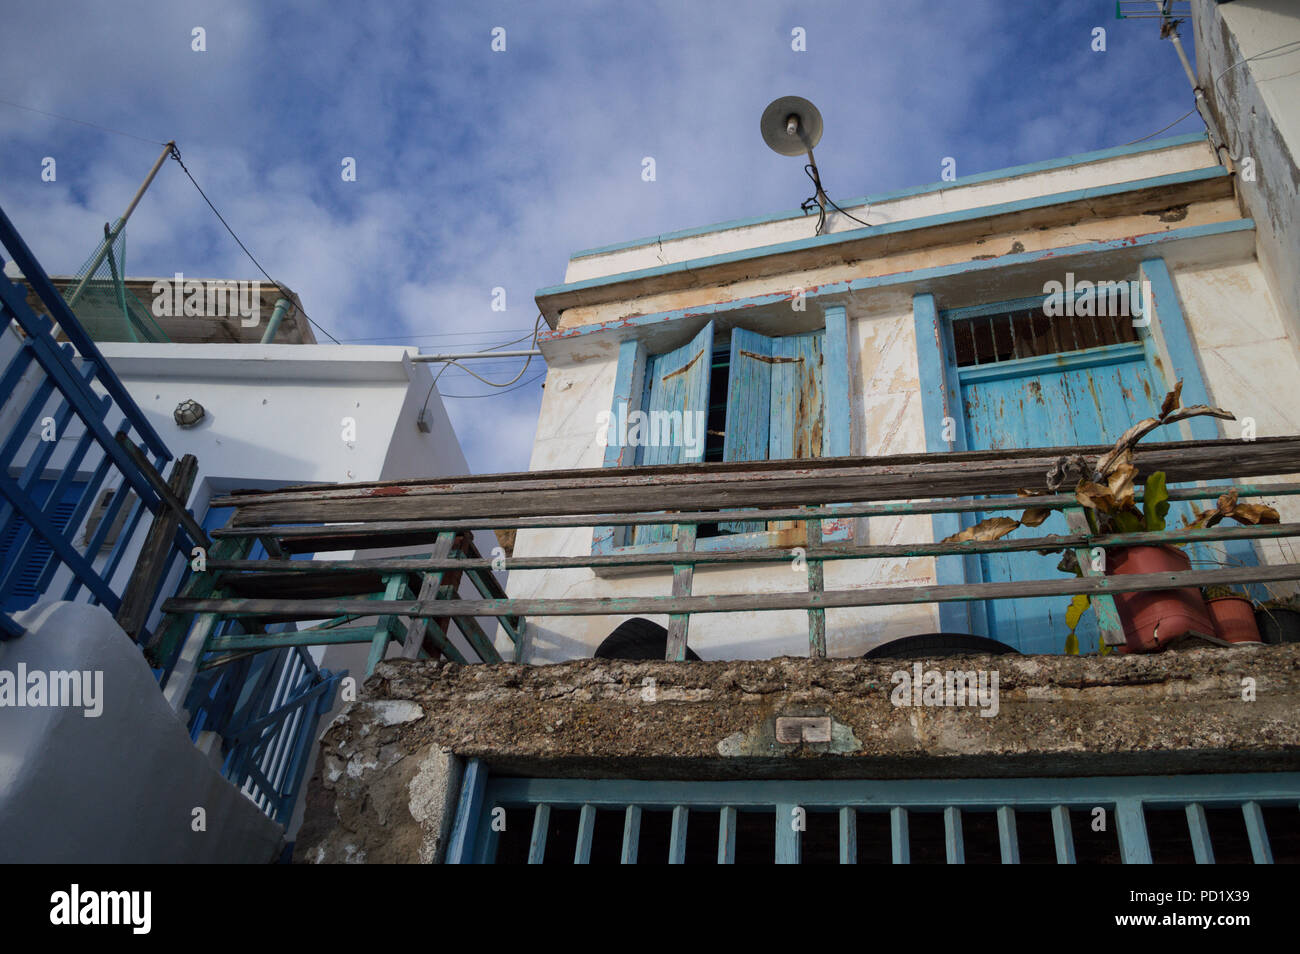 Traditional Greek Fishing Village Houses in Klima, Milos, Cyclades, Greece - Stock Image